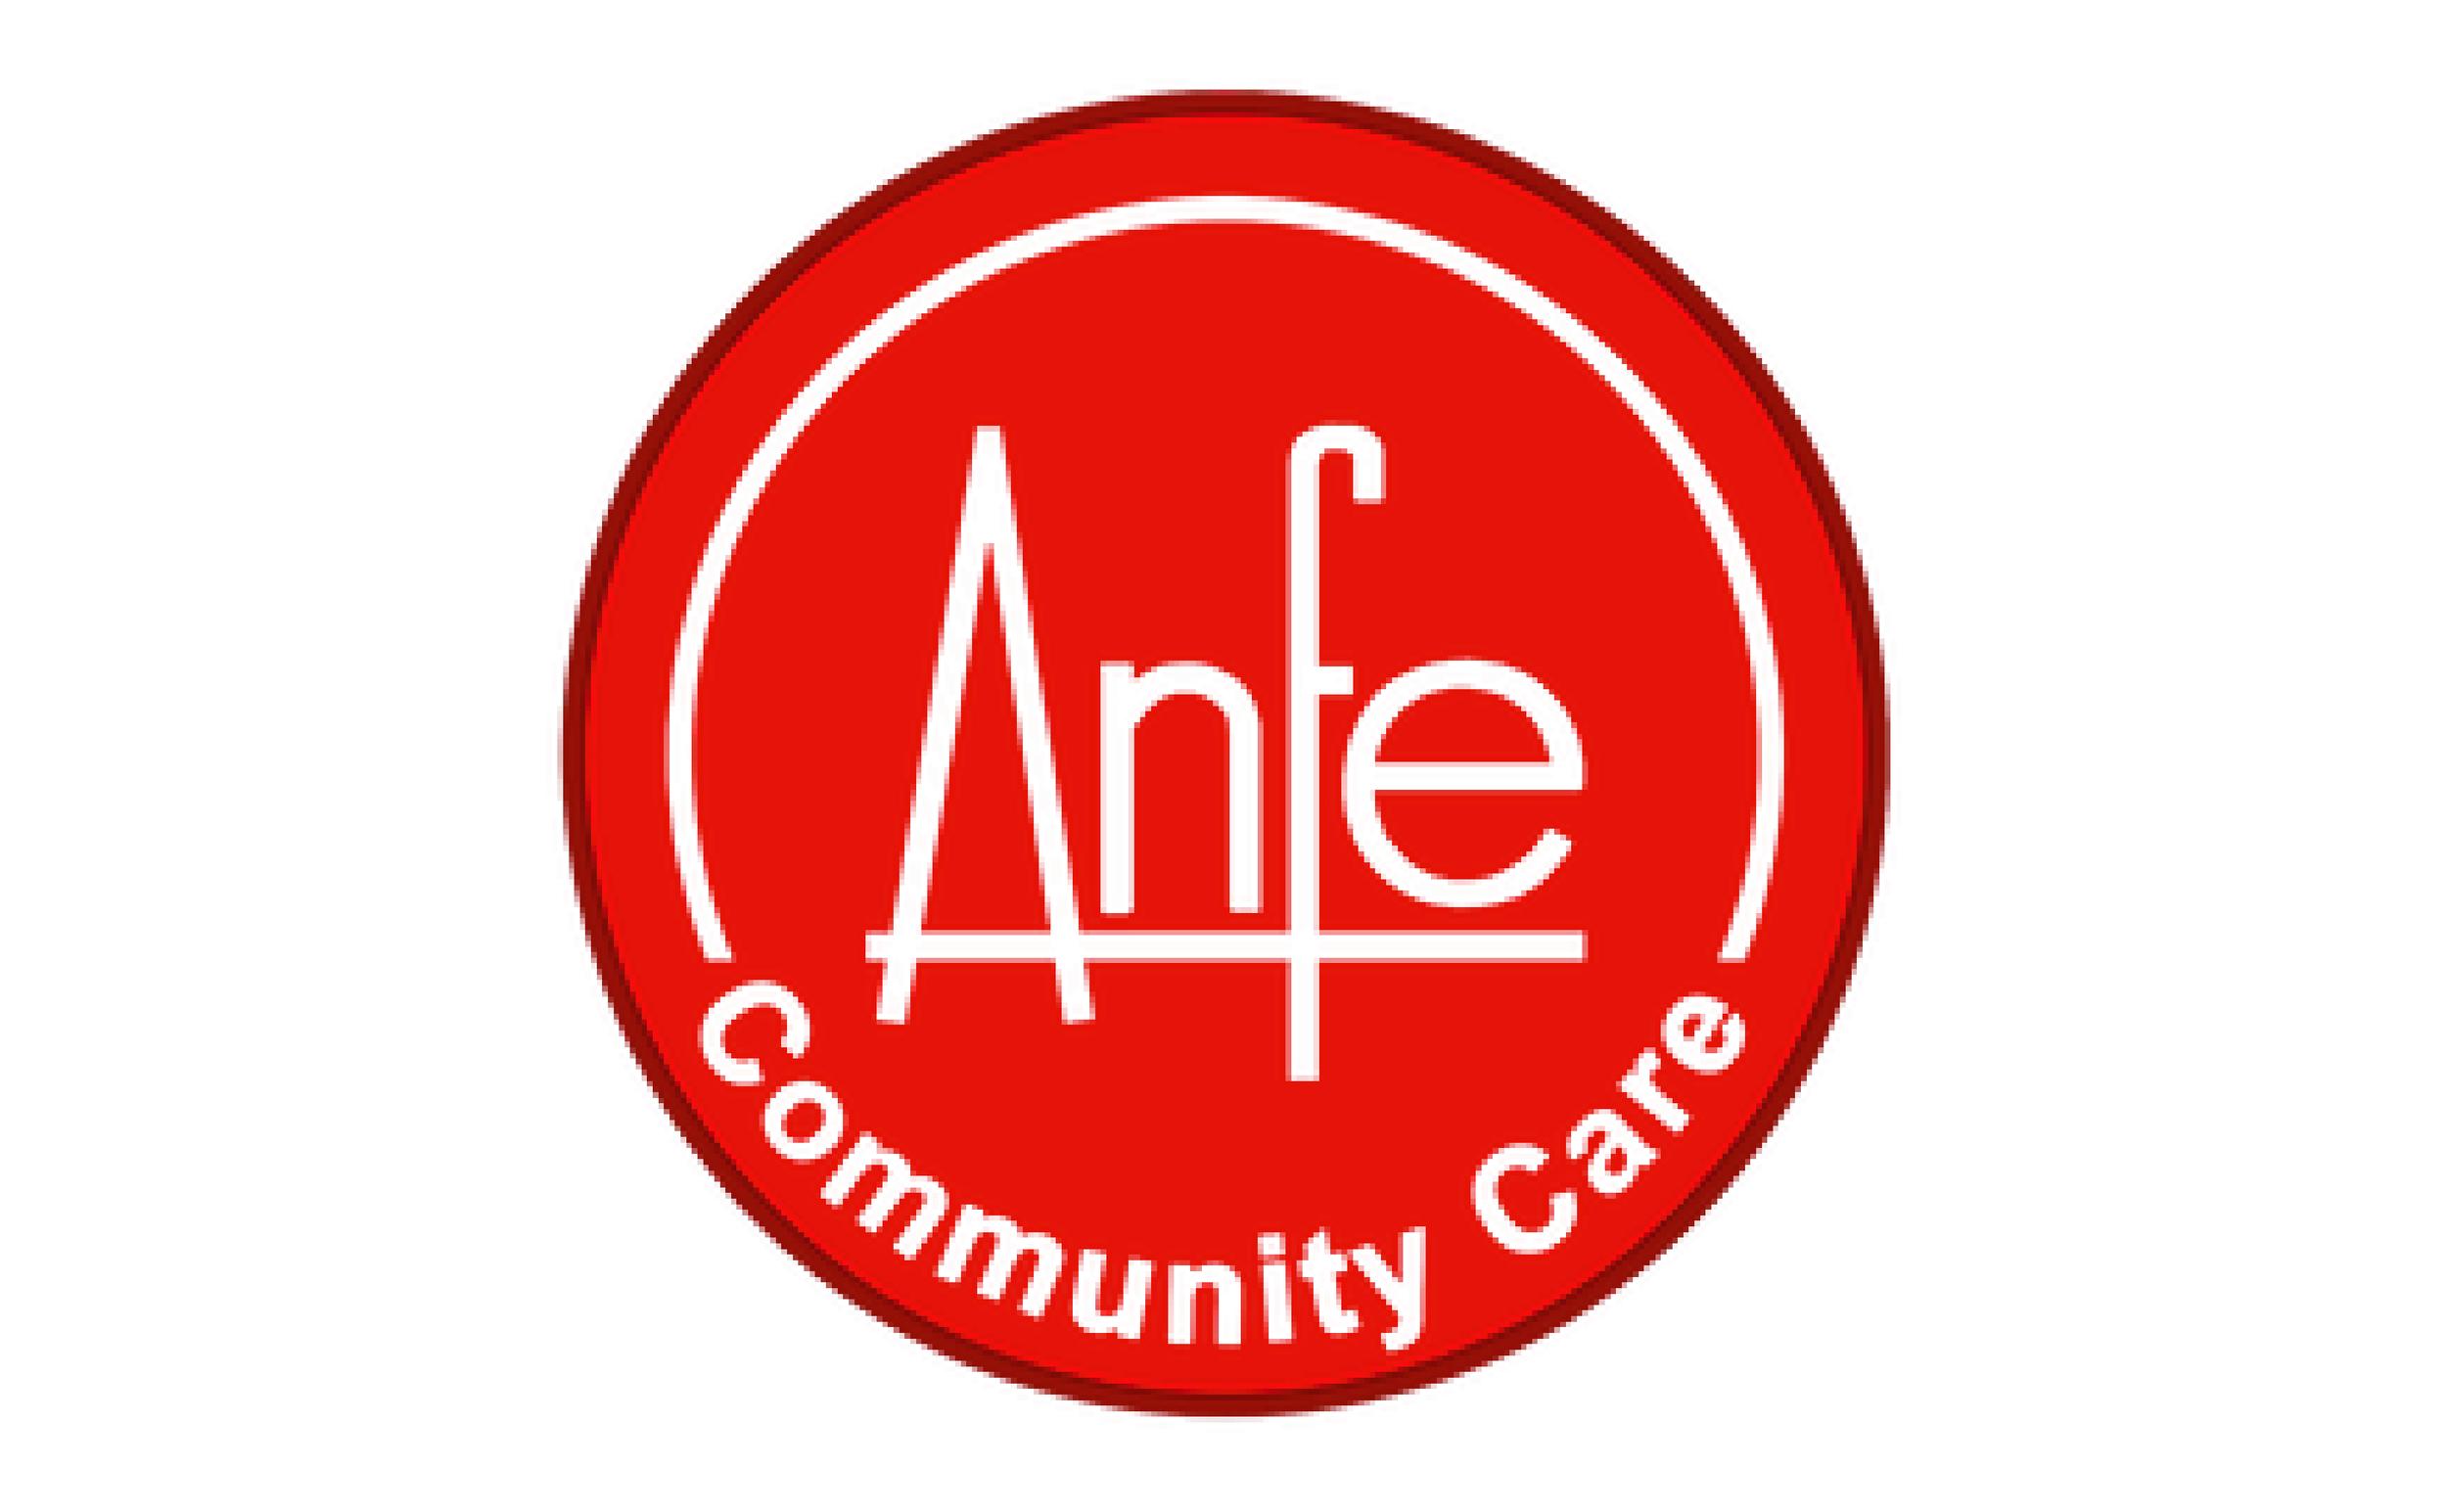 Anfe Community Care